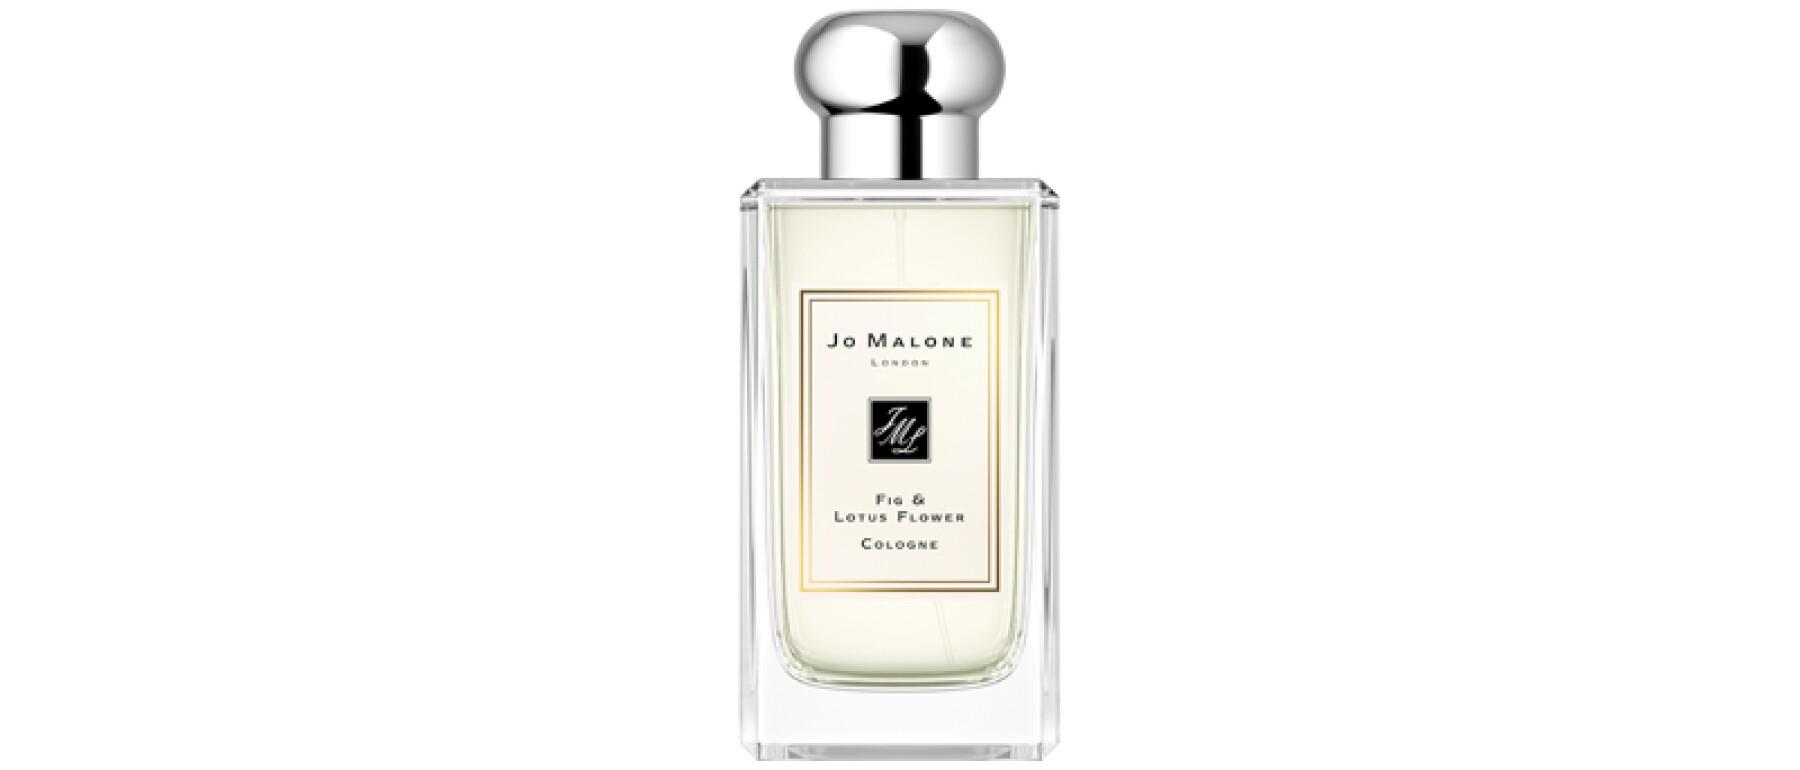 fragrances-autumn-jo malone.jpg